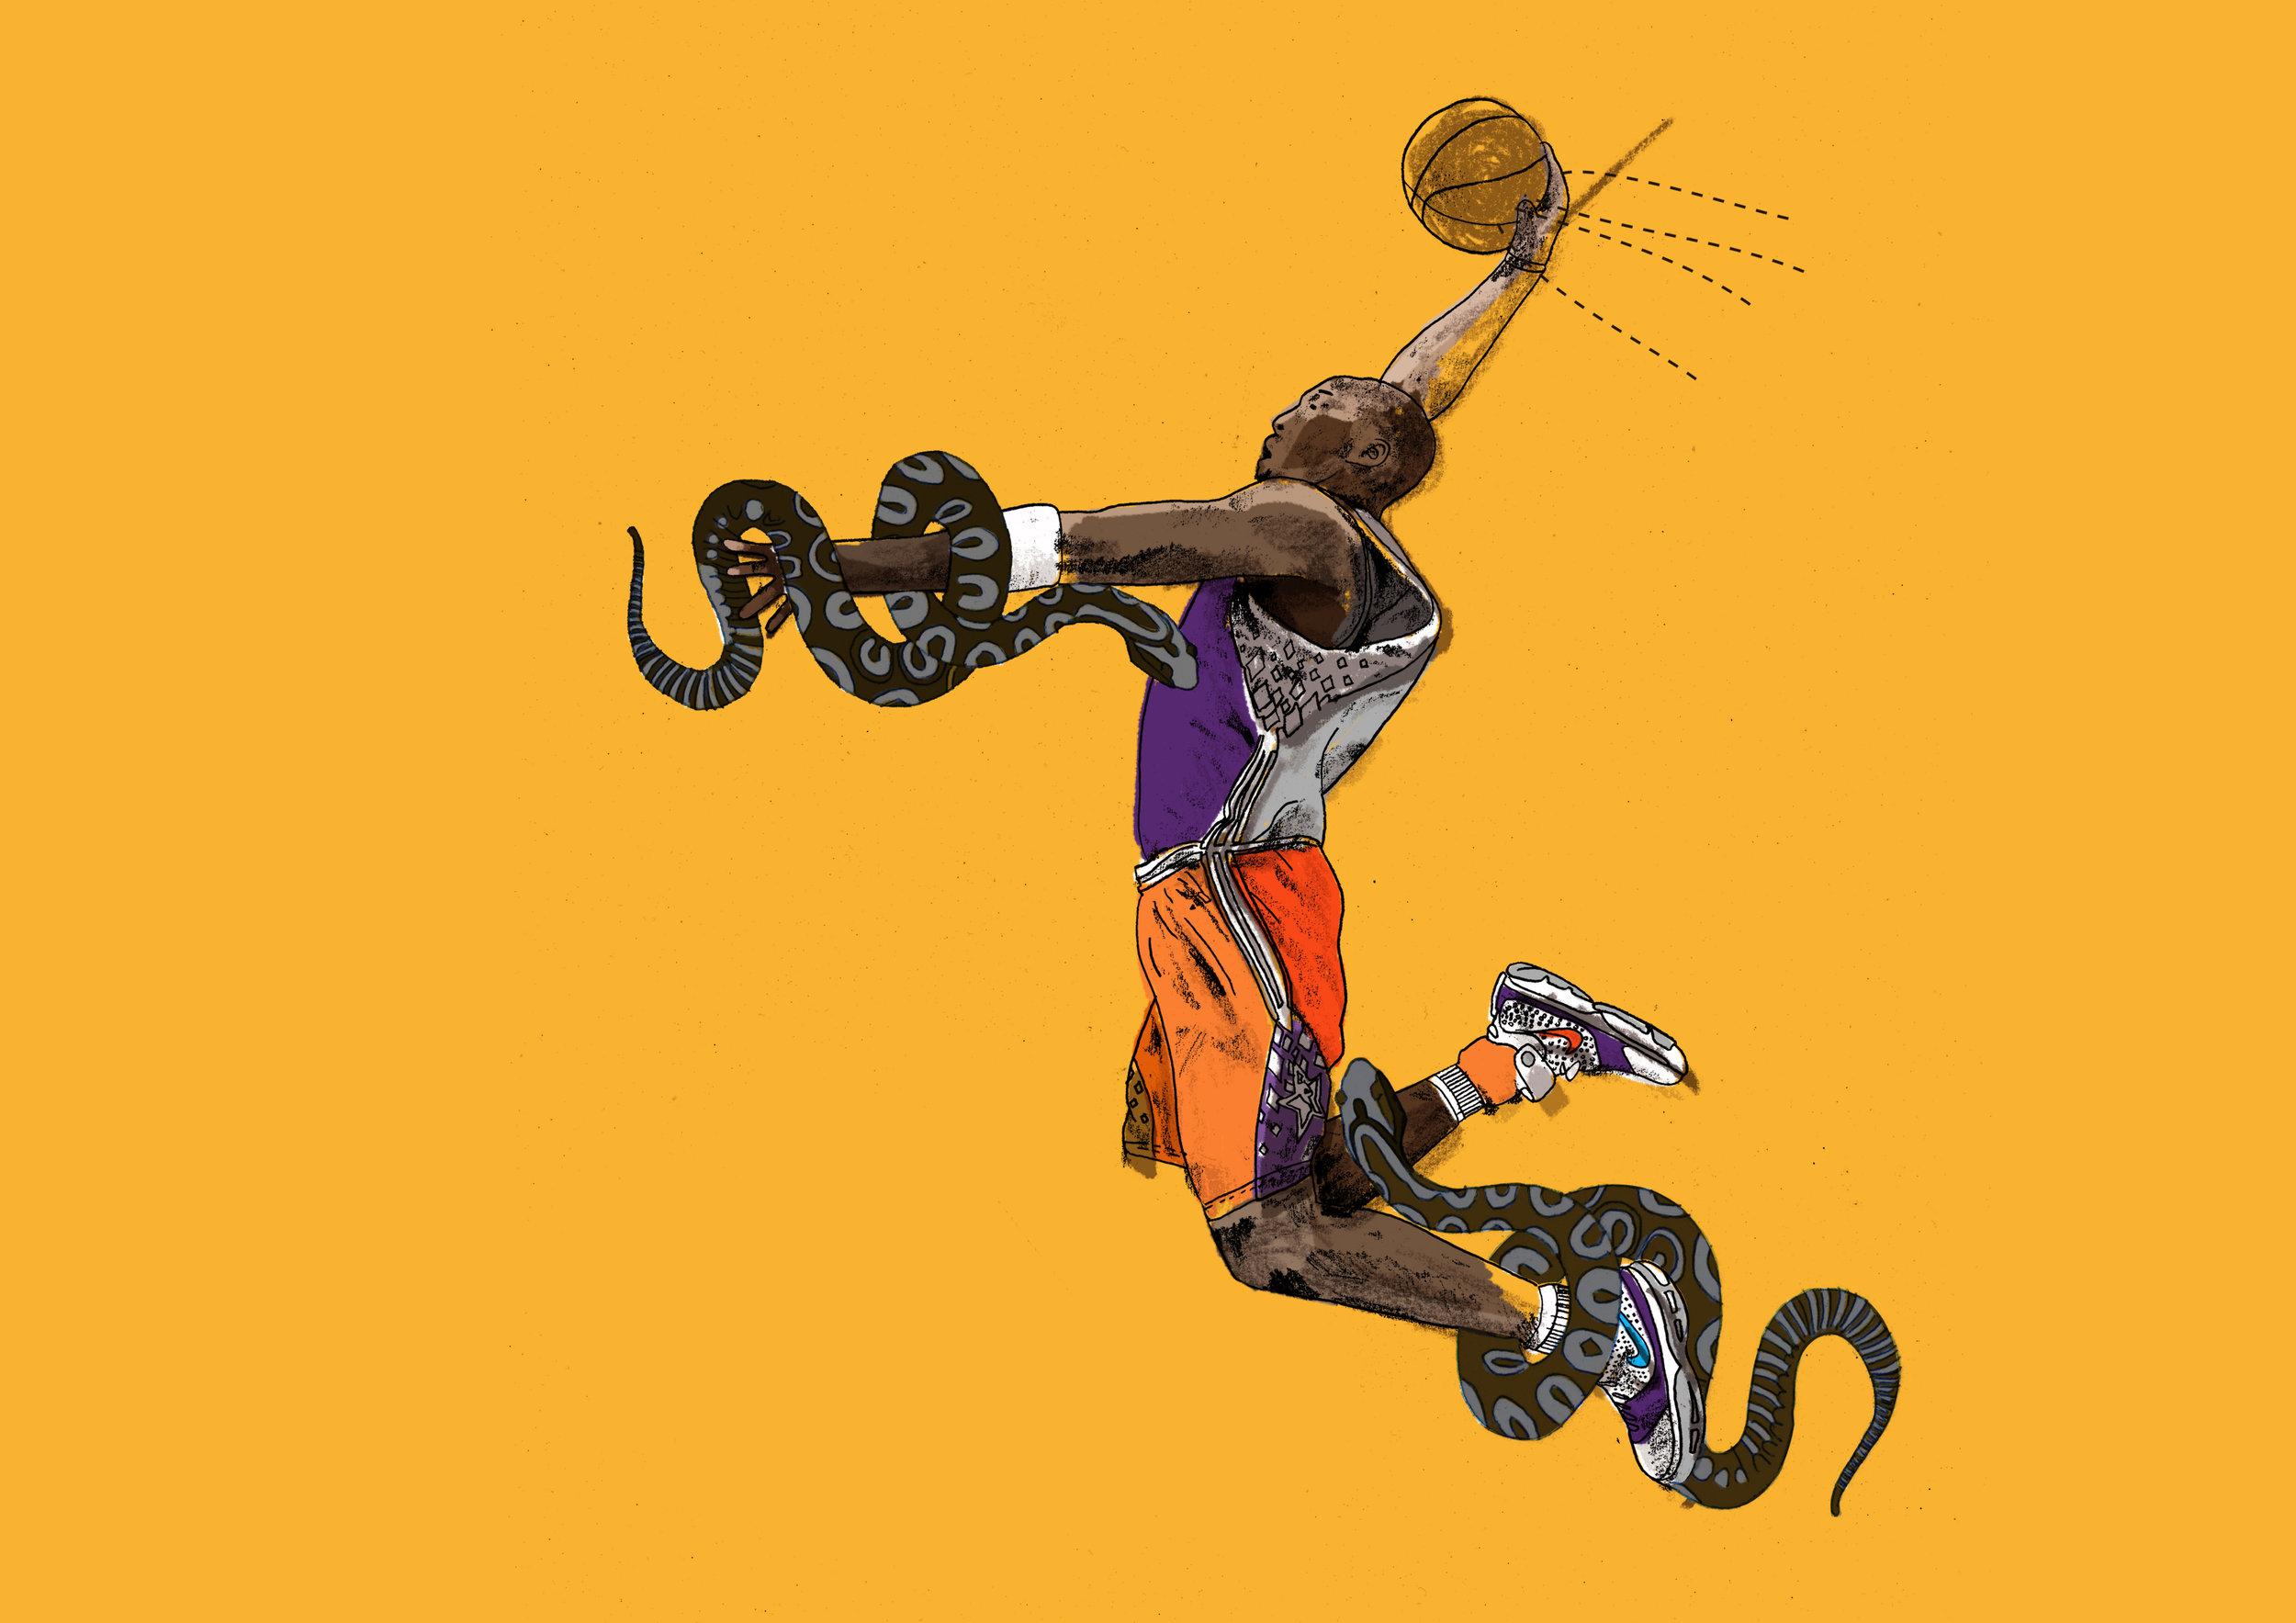 The_Black_Mamba_procreate_illustration.jpg